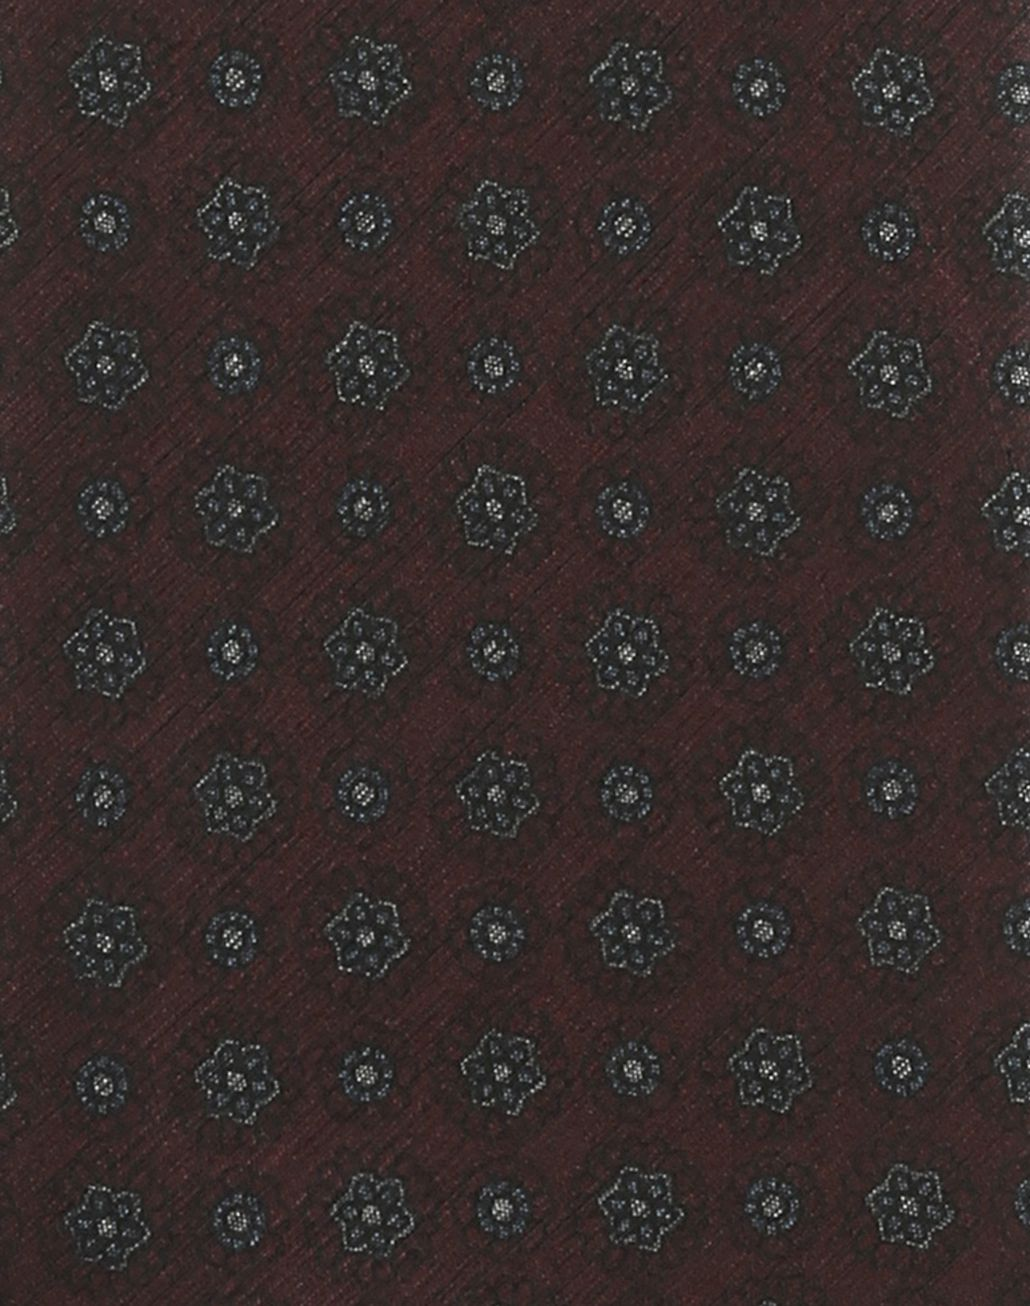 BRIONI Krawatte in der Farbe Amaranth mit großem Muster Krawatte [*** pickupInStoreShippingNotGuaranteed_info ***] e